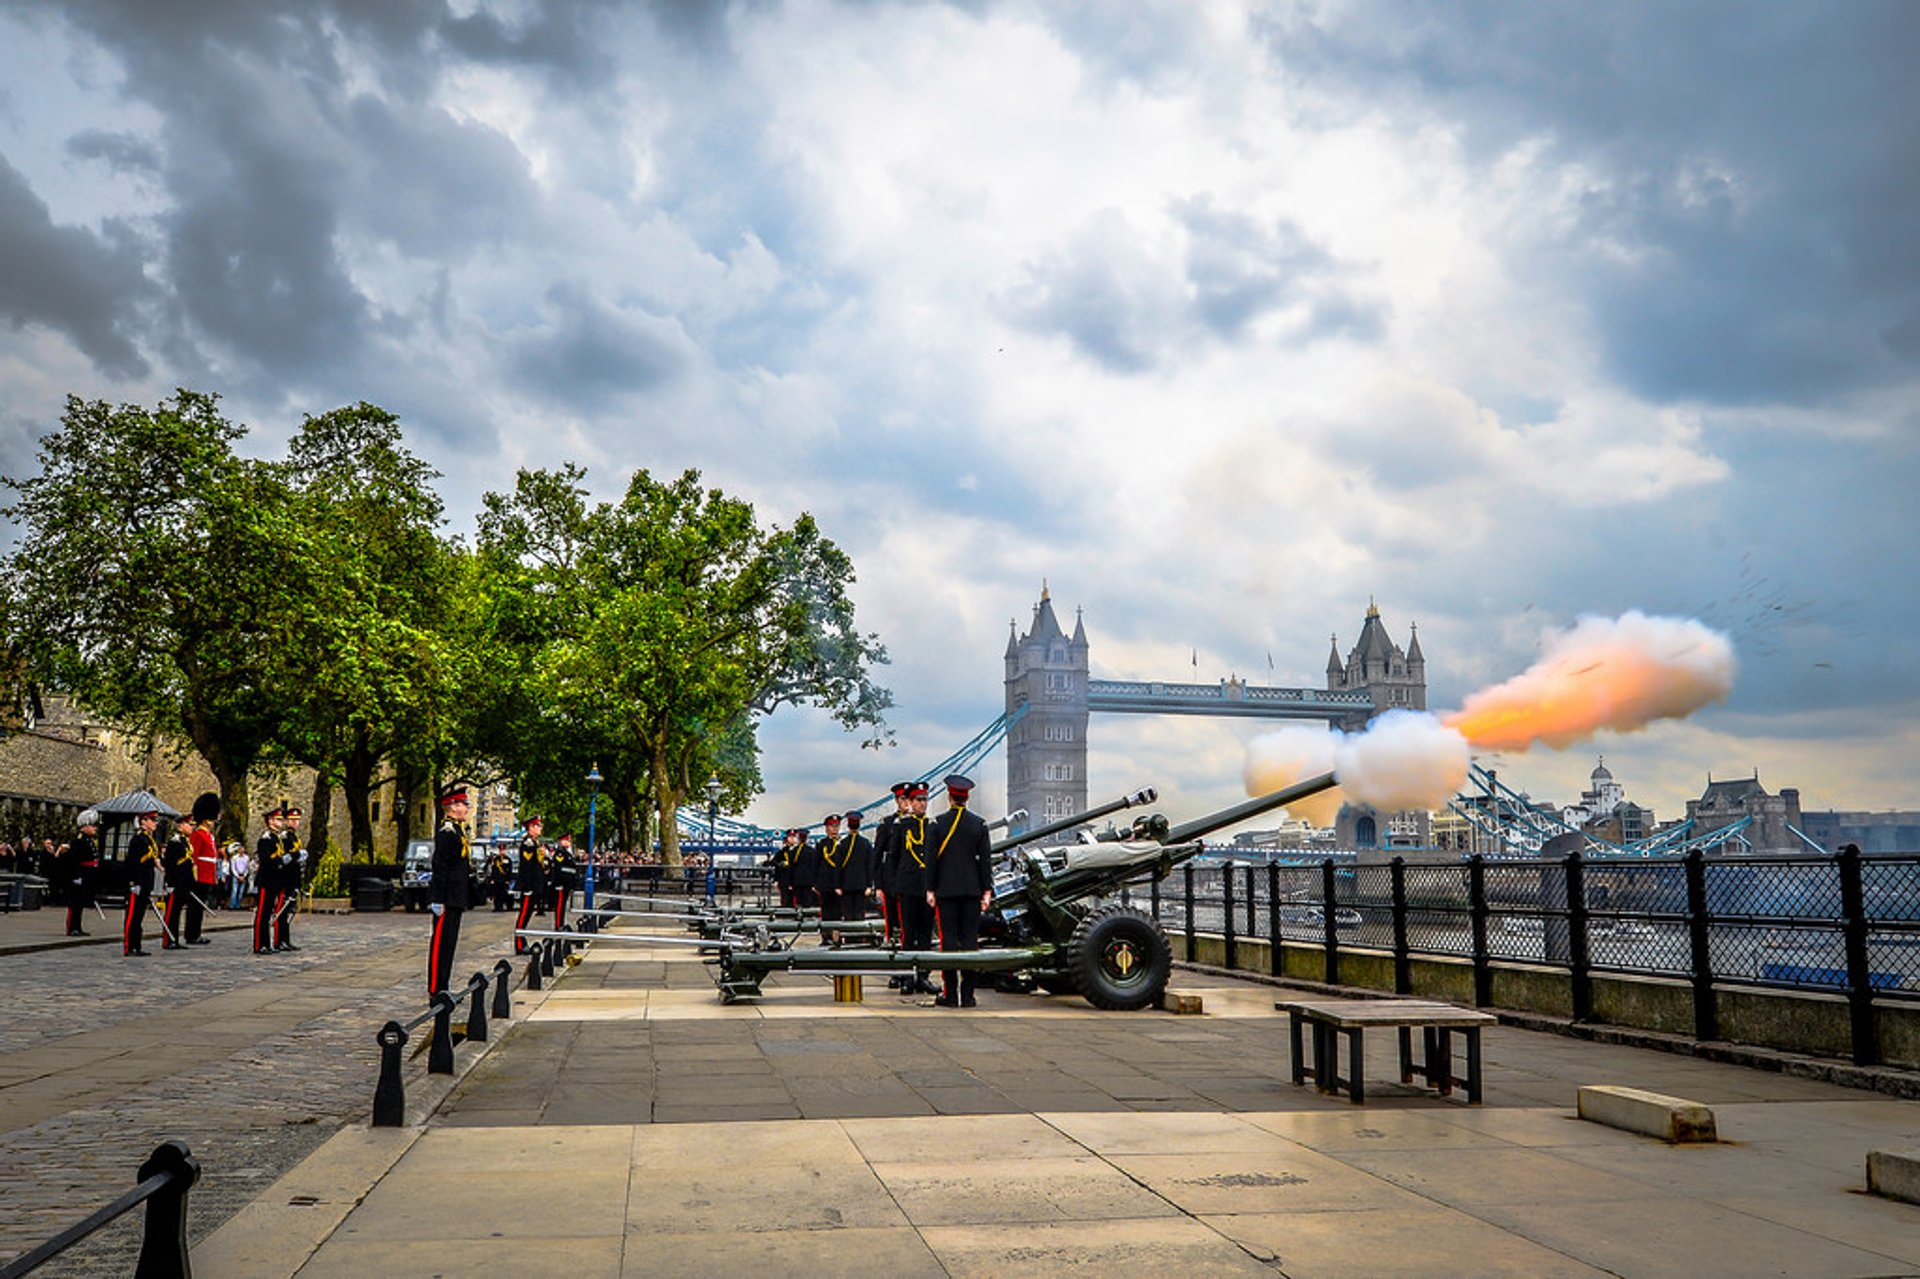 Royal Gun Salutes in London 2019 - Best Time